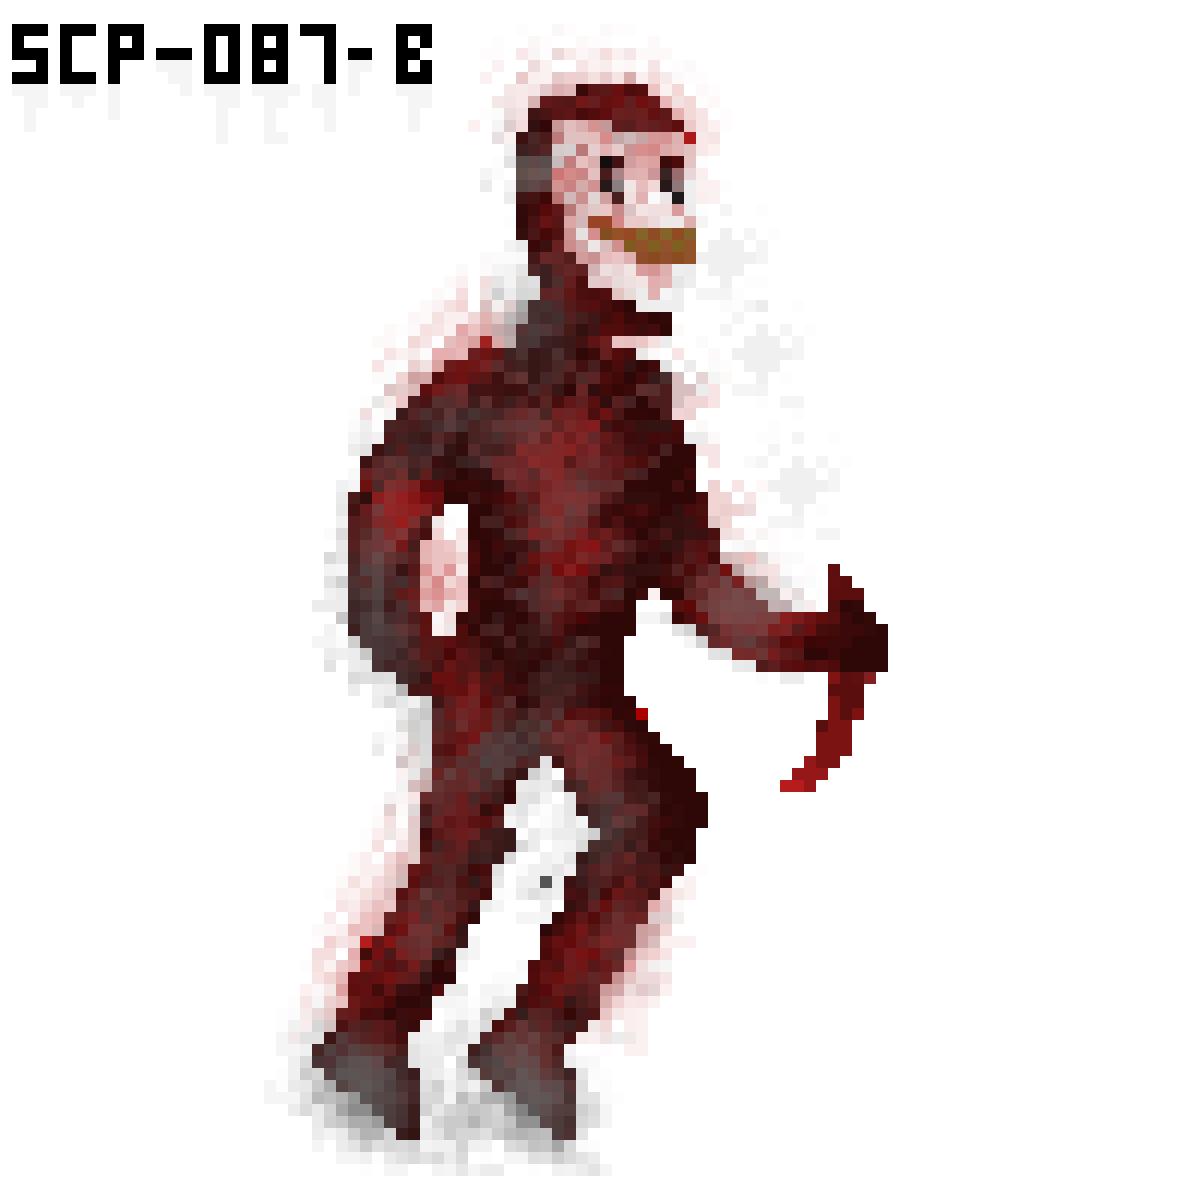 Pixilart - SCP-087-B by SCPpixel